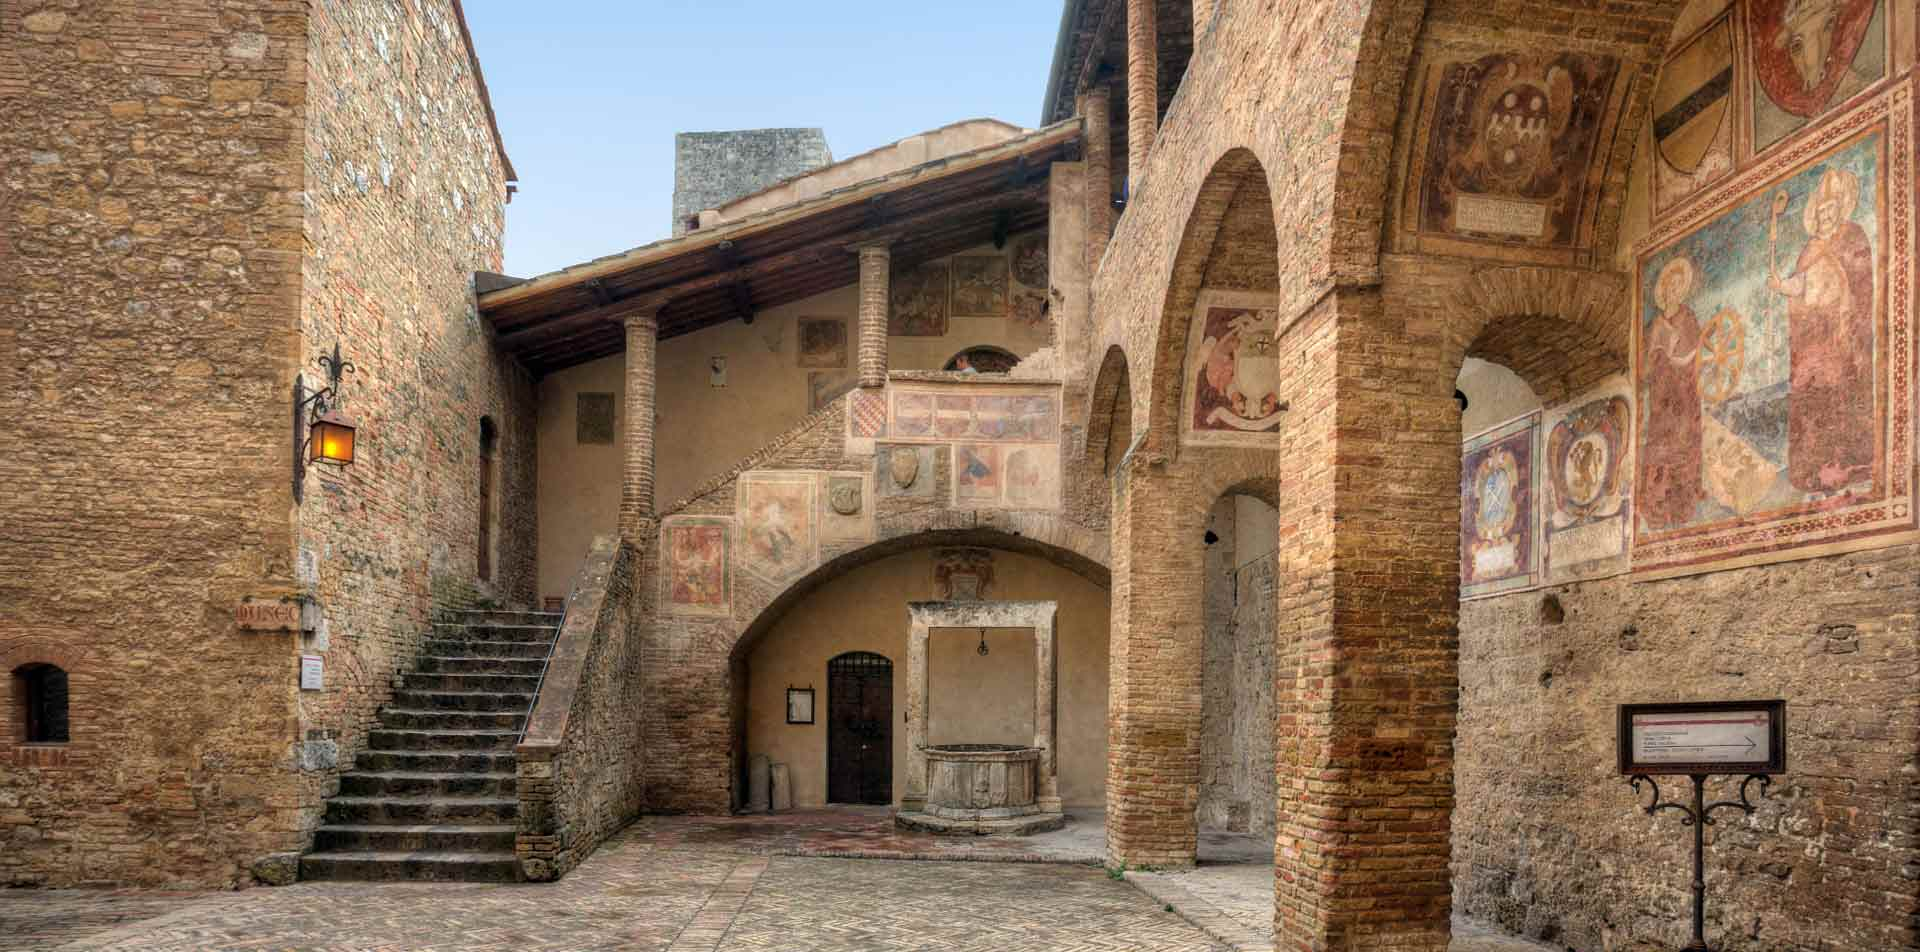 Tour al Chianti y San Gimignano desde Siena